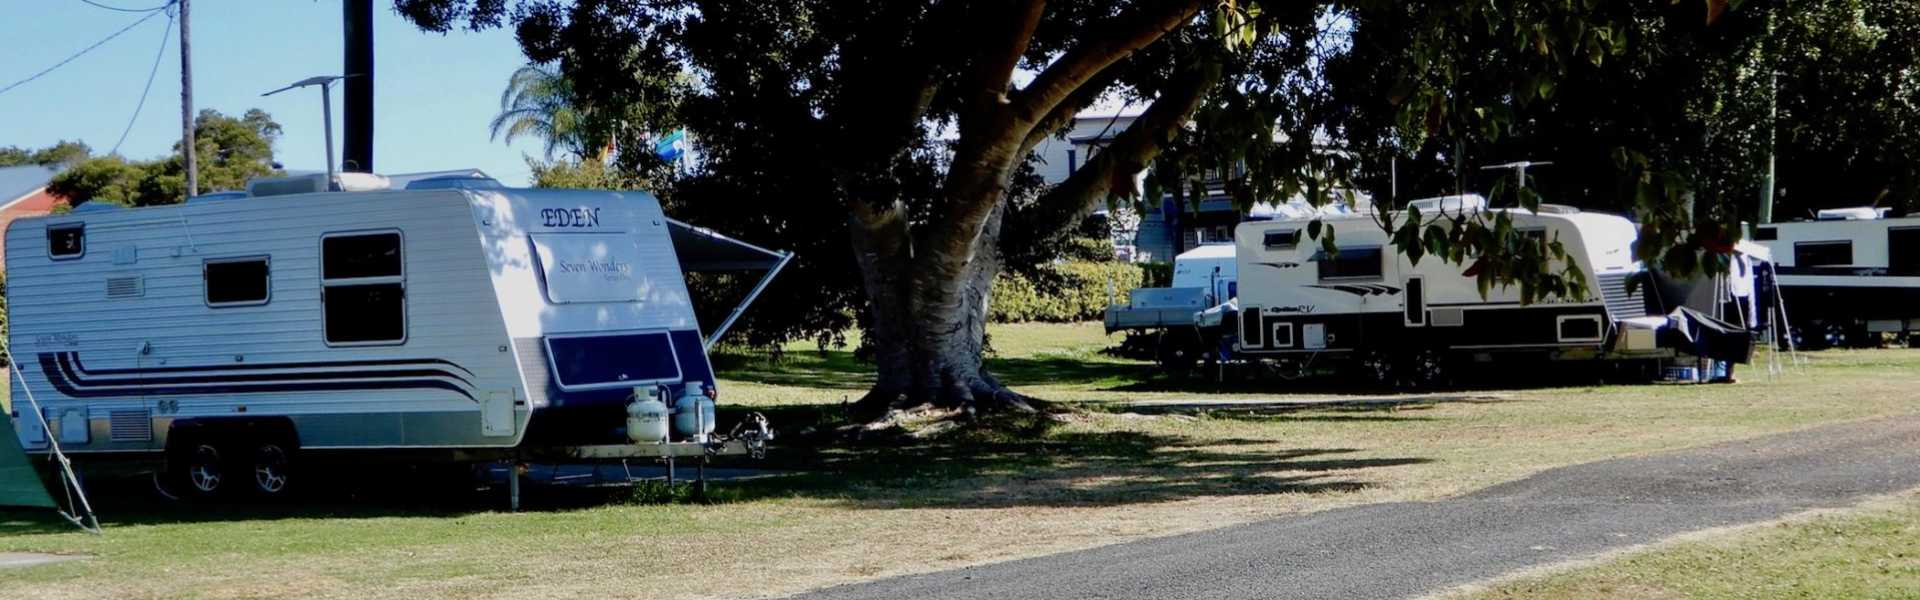 Kui Parks, Coraki Riverside Caravan Park, Caravan Park, Sites